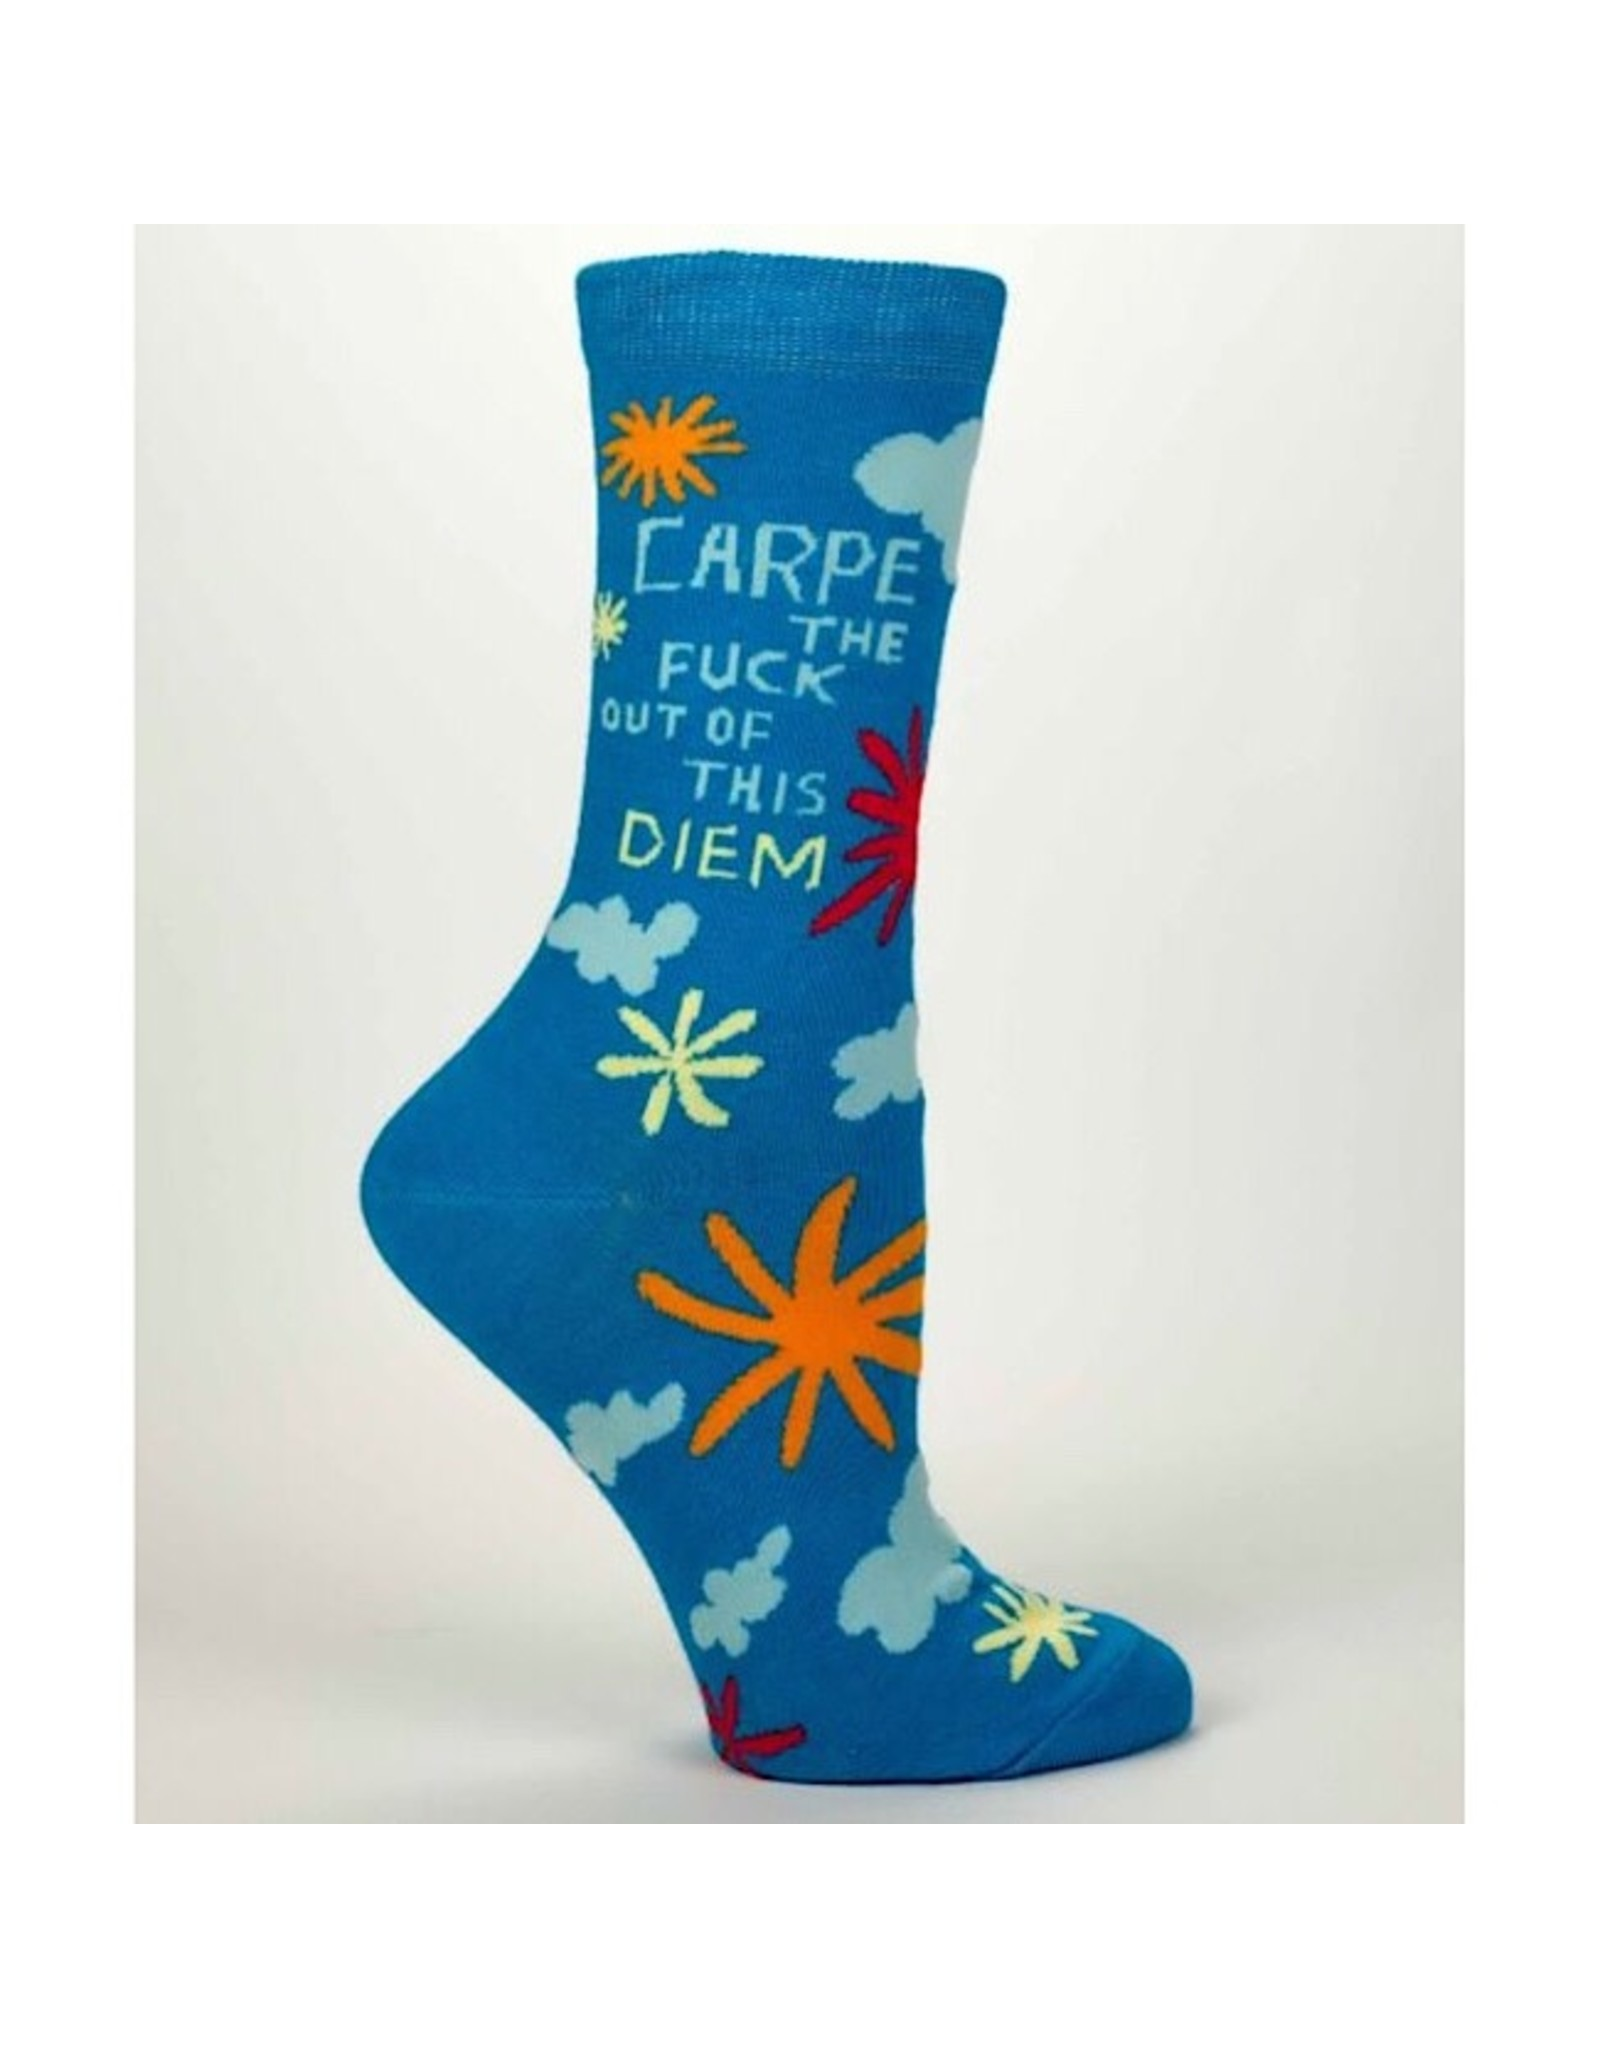 Socks (Womens) - Carpe The Fuck Out Of This Diem